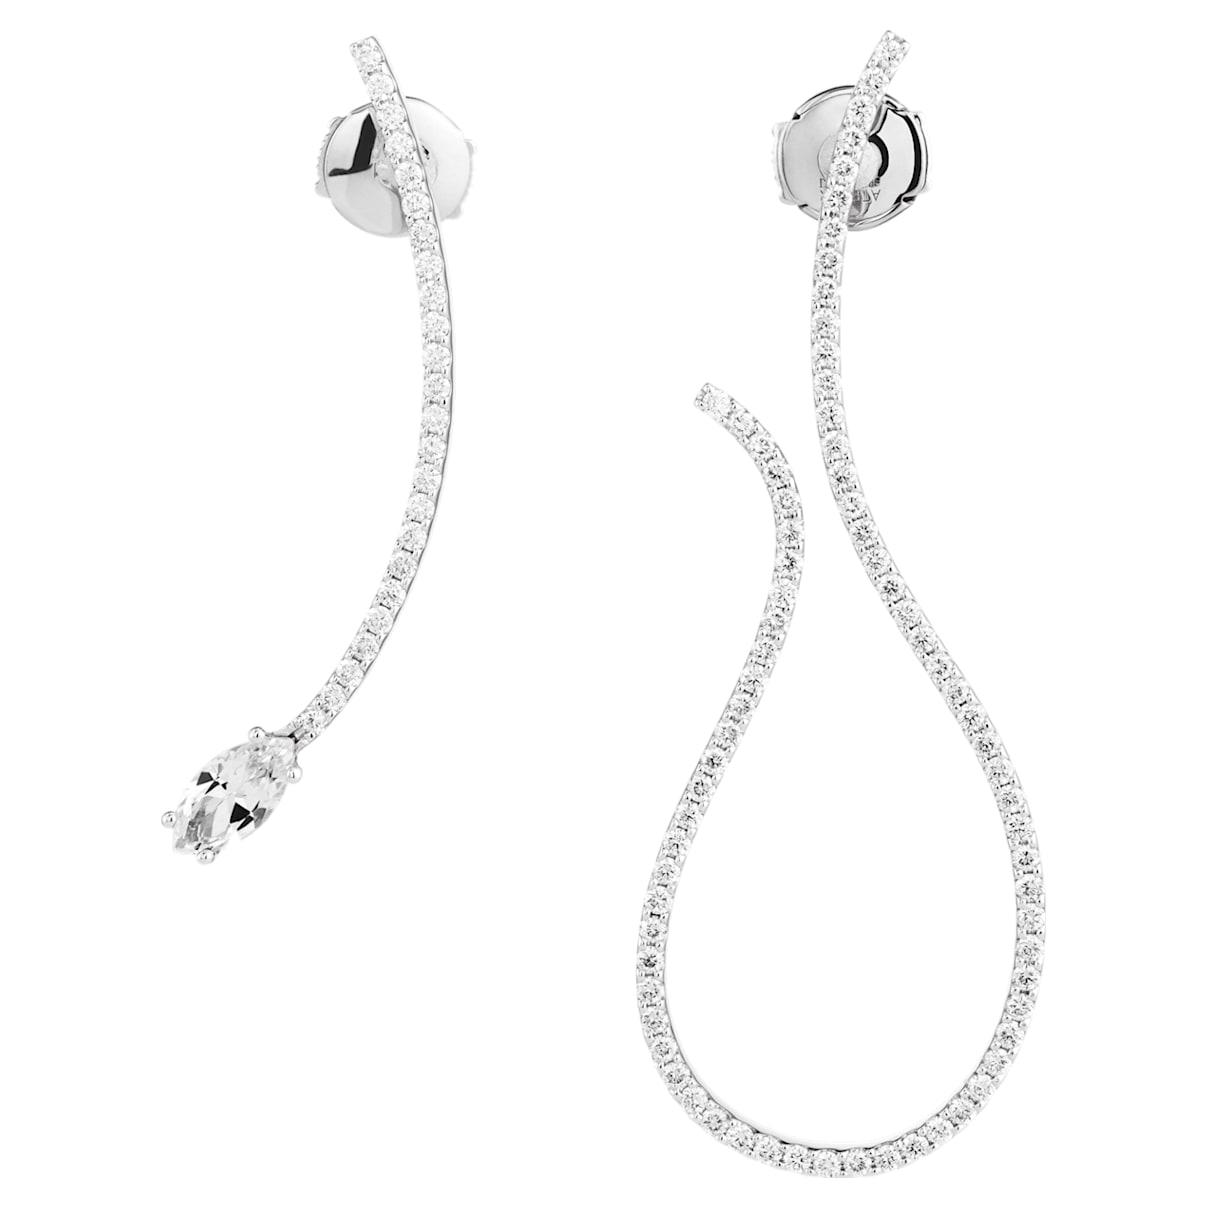 Arc-en-ciel Mis-matched Earrings, Swarovski Genuine Topaz & Swarovski Created Diamonds, 18K White Gold